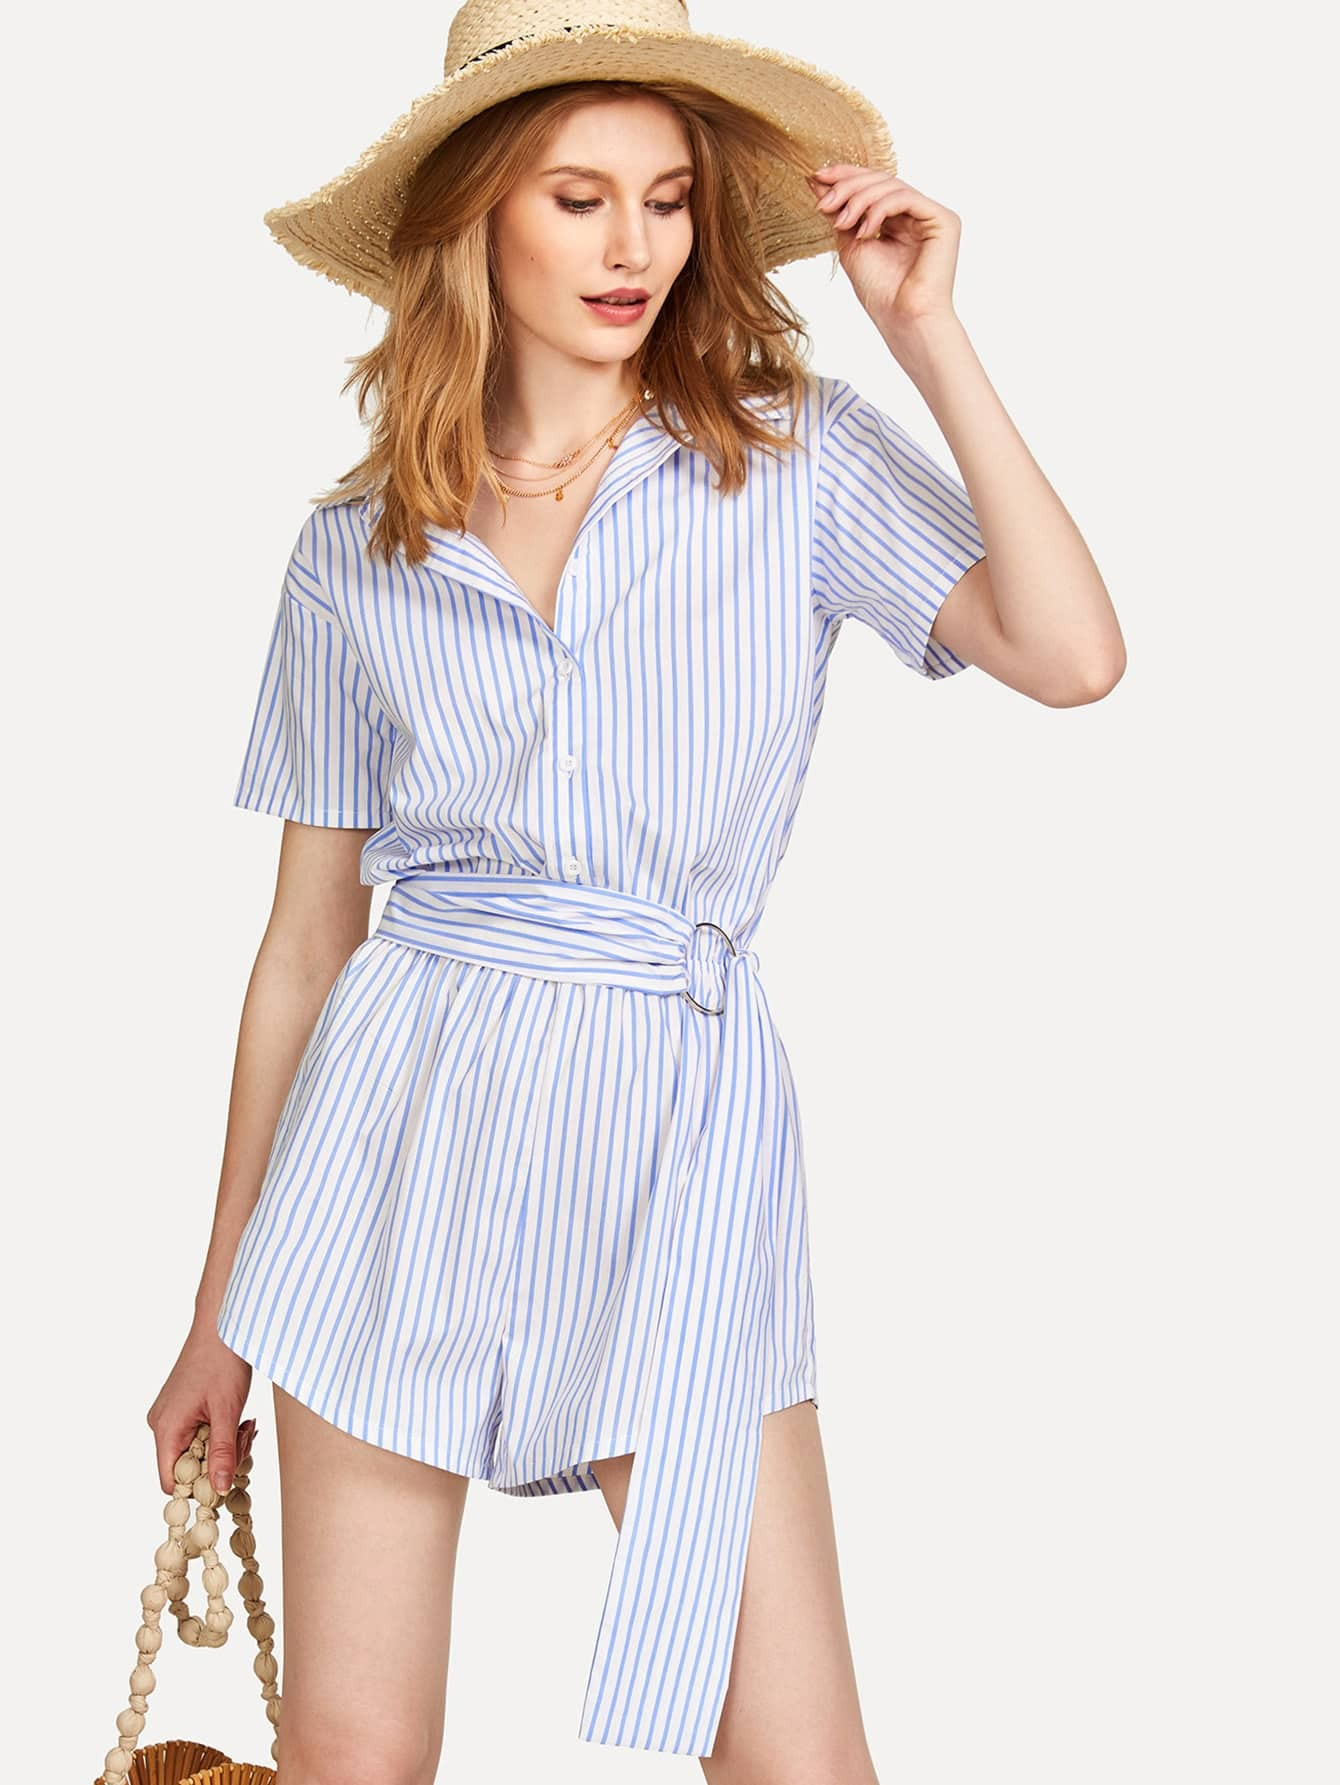 O-Ring Belted Striped Shirt Romper pu belted tartan shirt